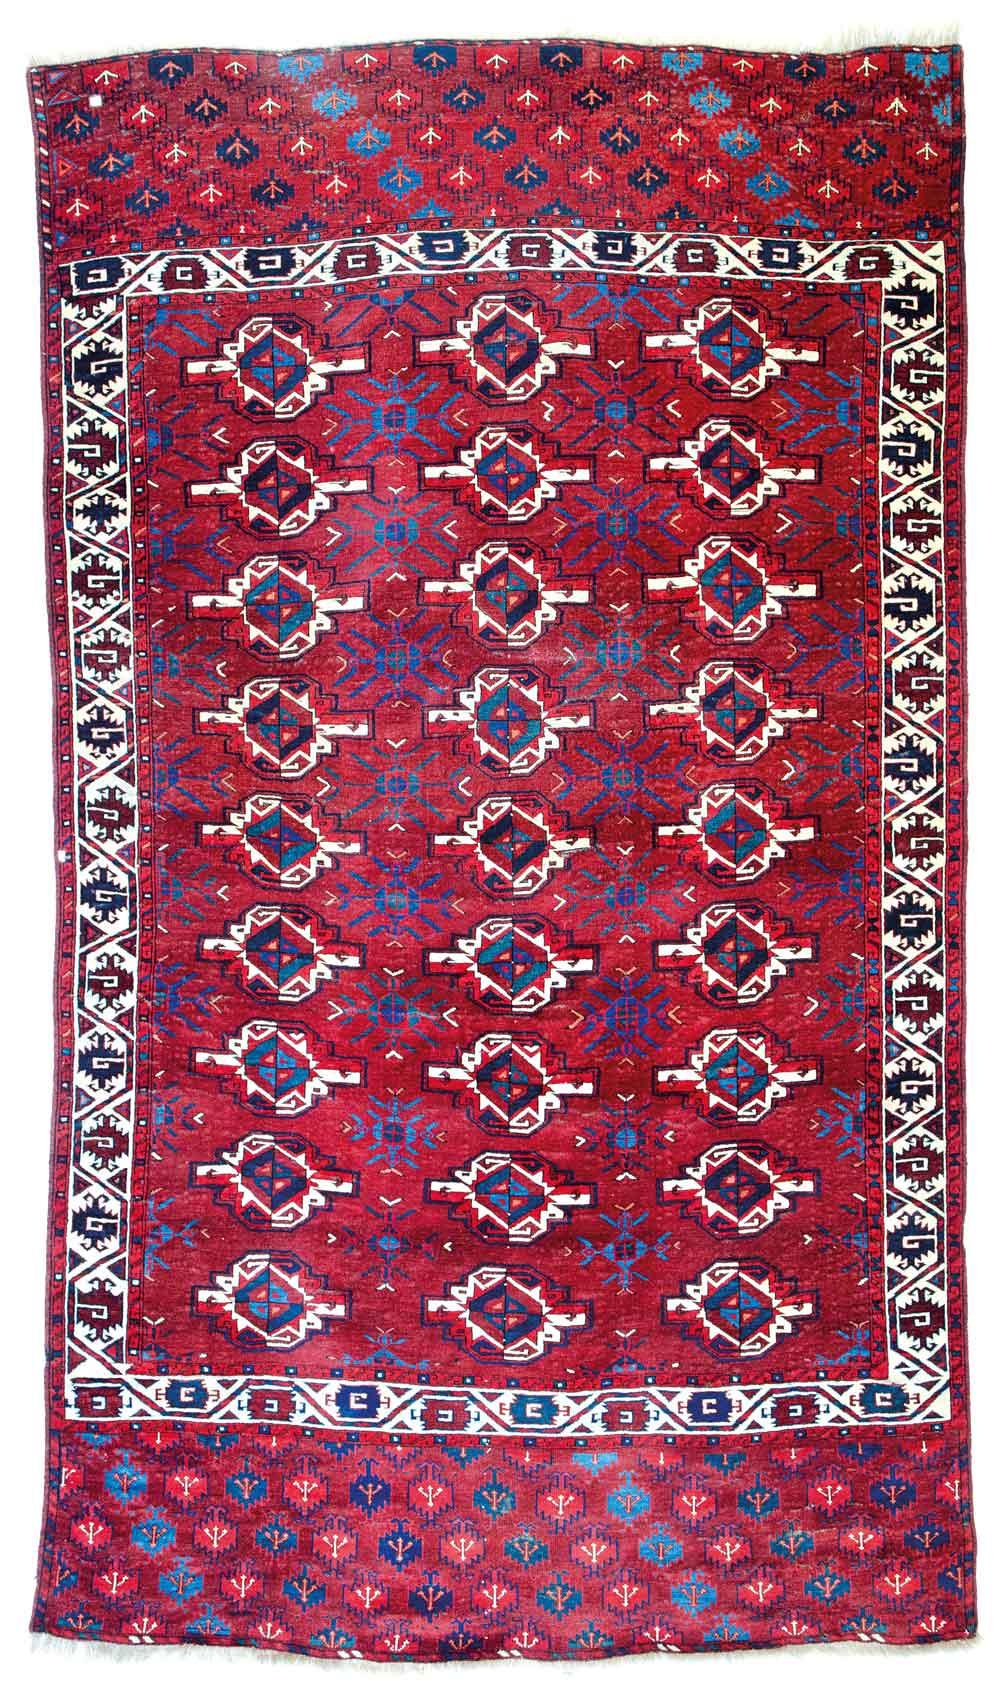 Lot 124, Yomut main carpet, Turkmenistan circa 1800, 9ft. 2in. x 5ft. 3in. Estimate: € 50,000 – 70,000